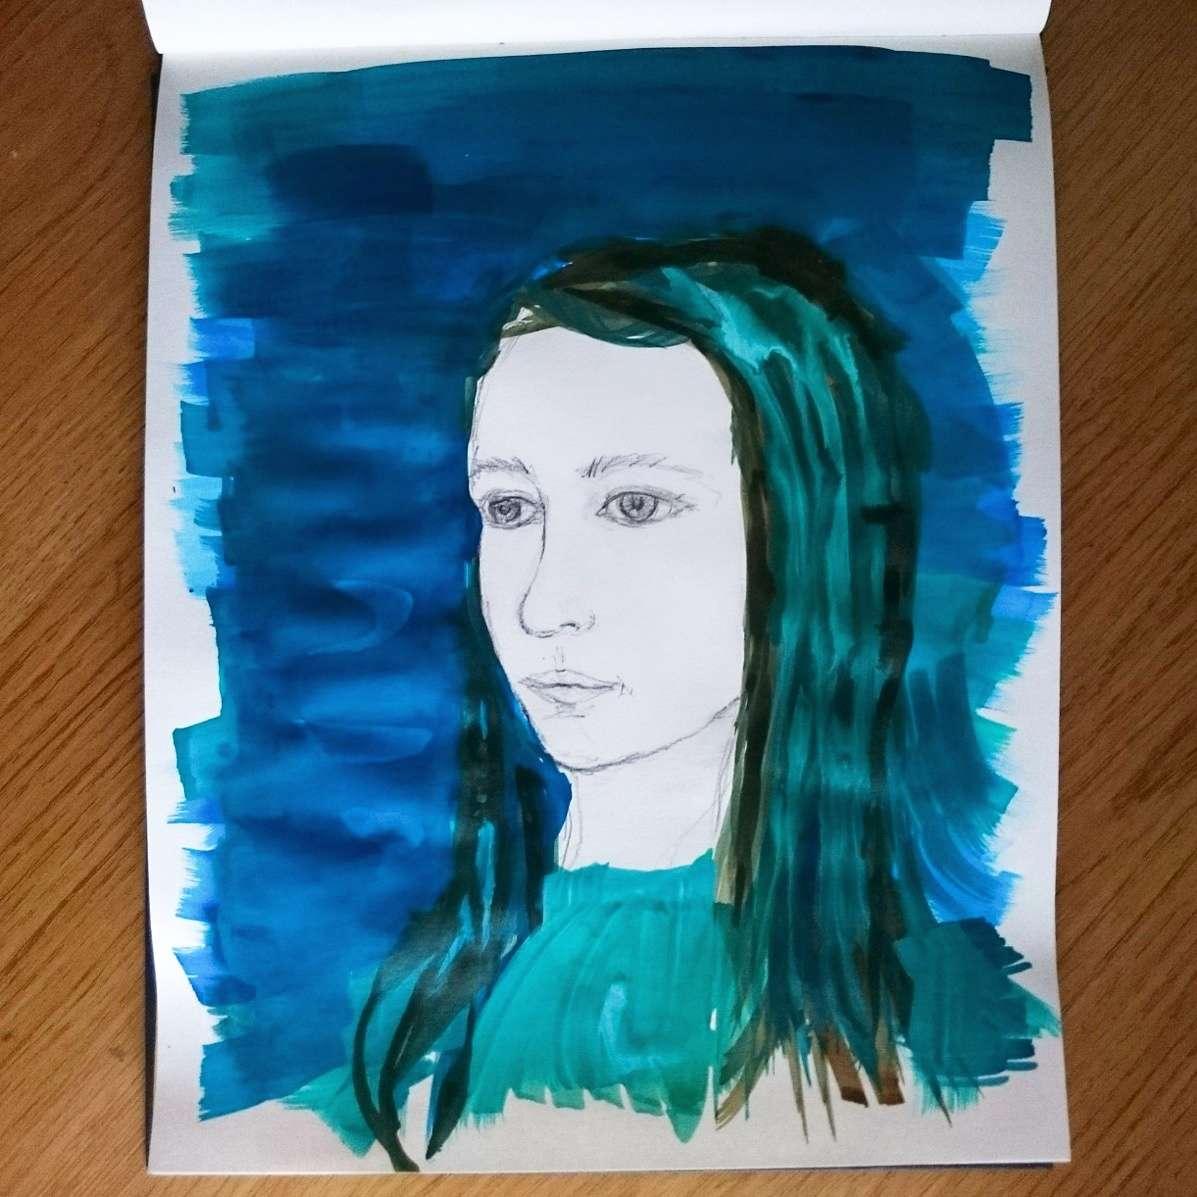 Day 10 28 Drawings Later Sketchbook Challenge by Jo Degenhart